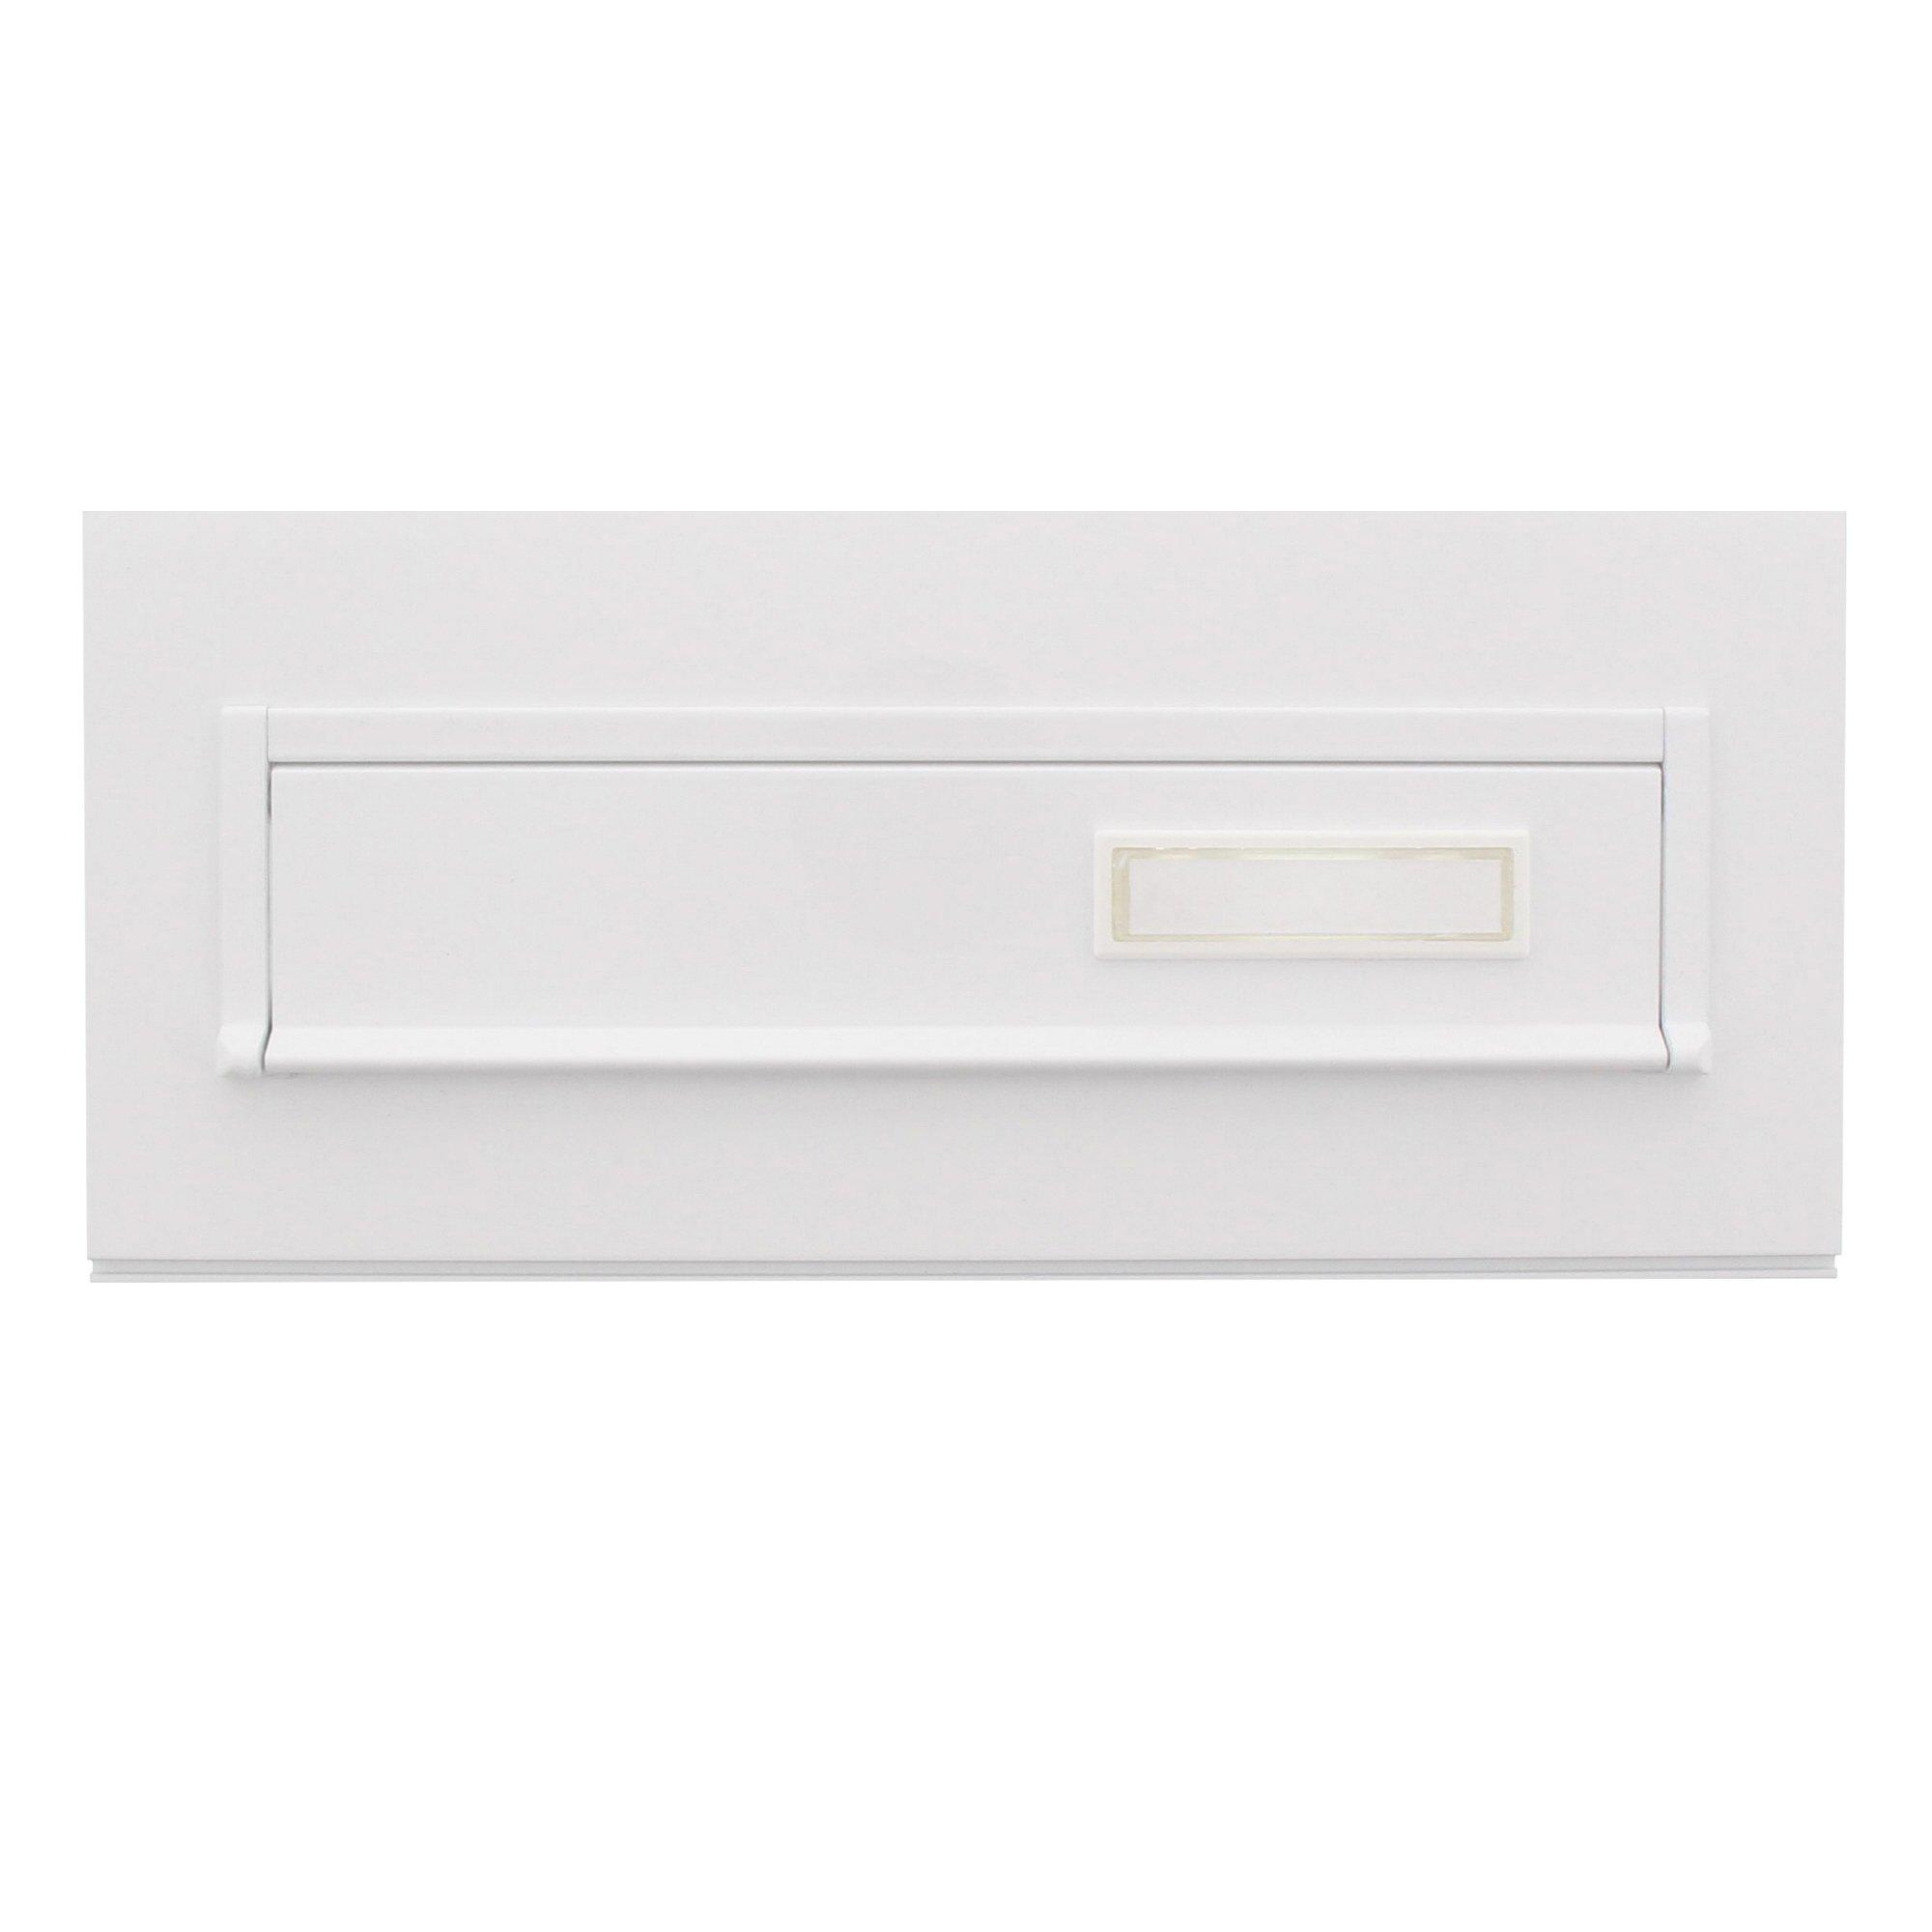 Burg-Wächter Blende 794 W 797 Blind for''Through The Wall'' Letterbox, White